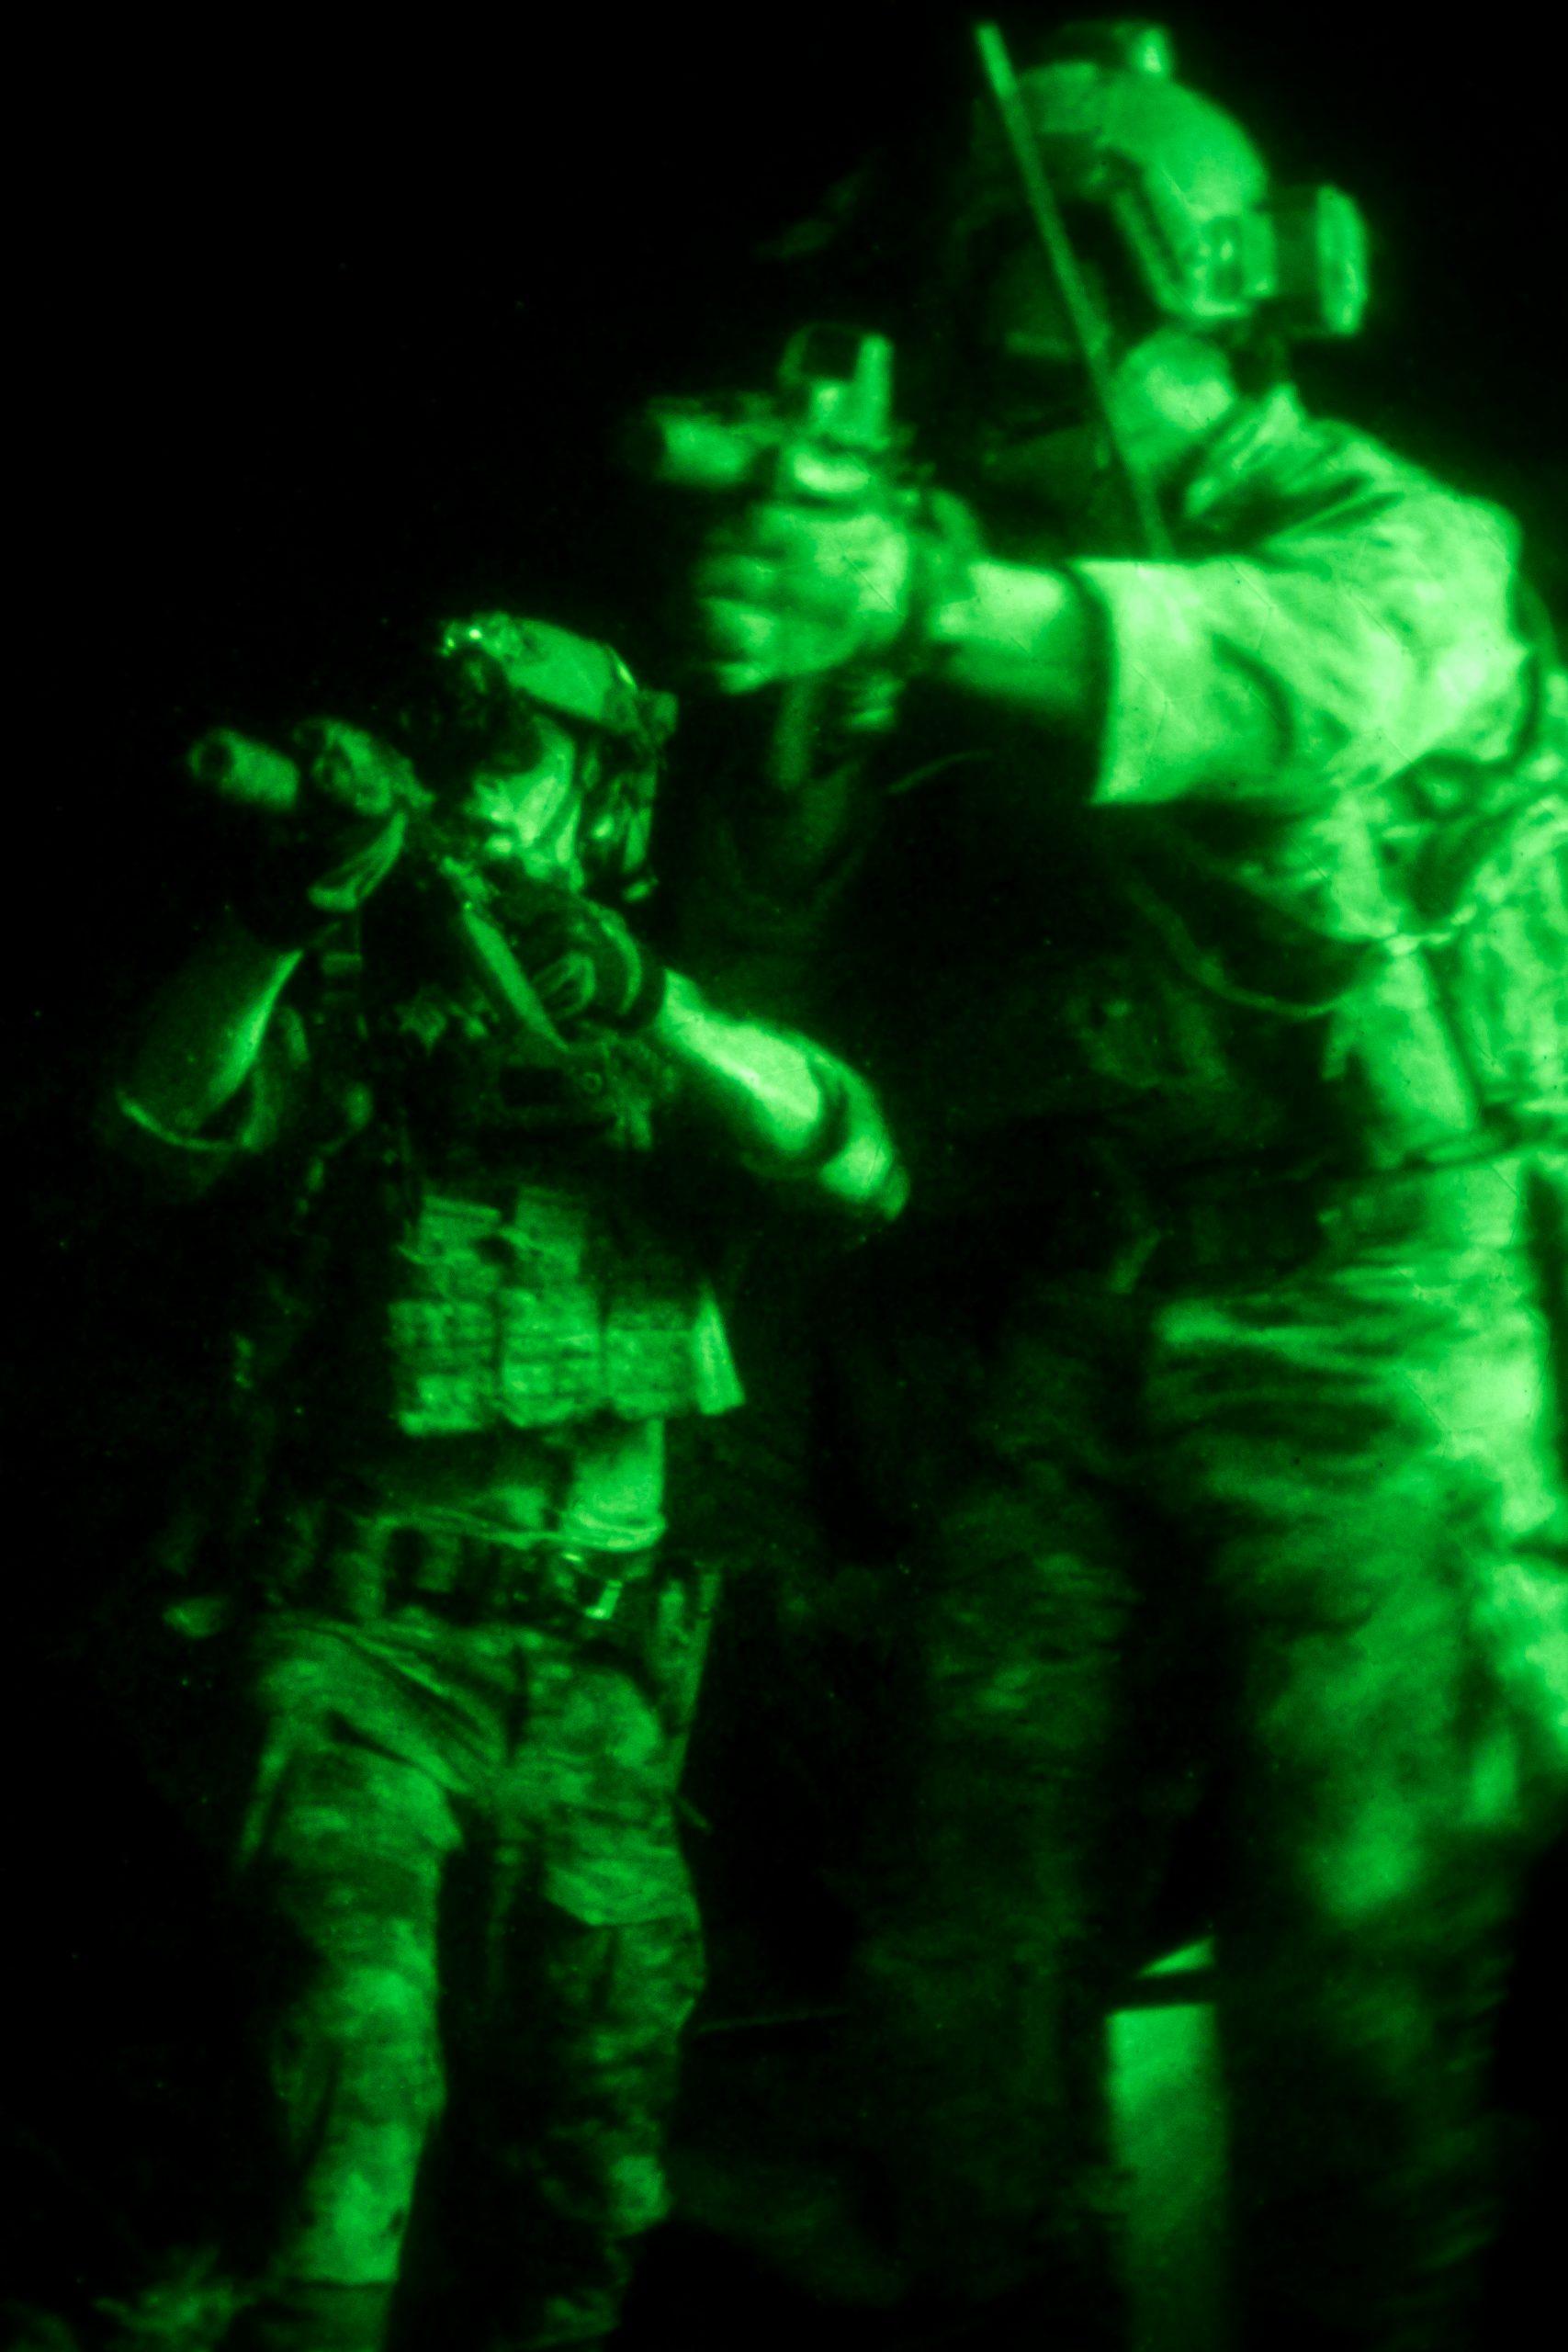 Cobra Gold 20: Royal Thai, US Special Forces conduct night raid